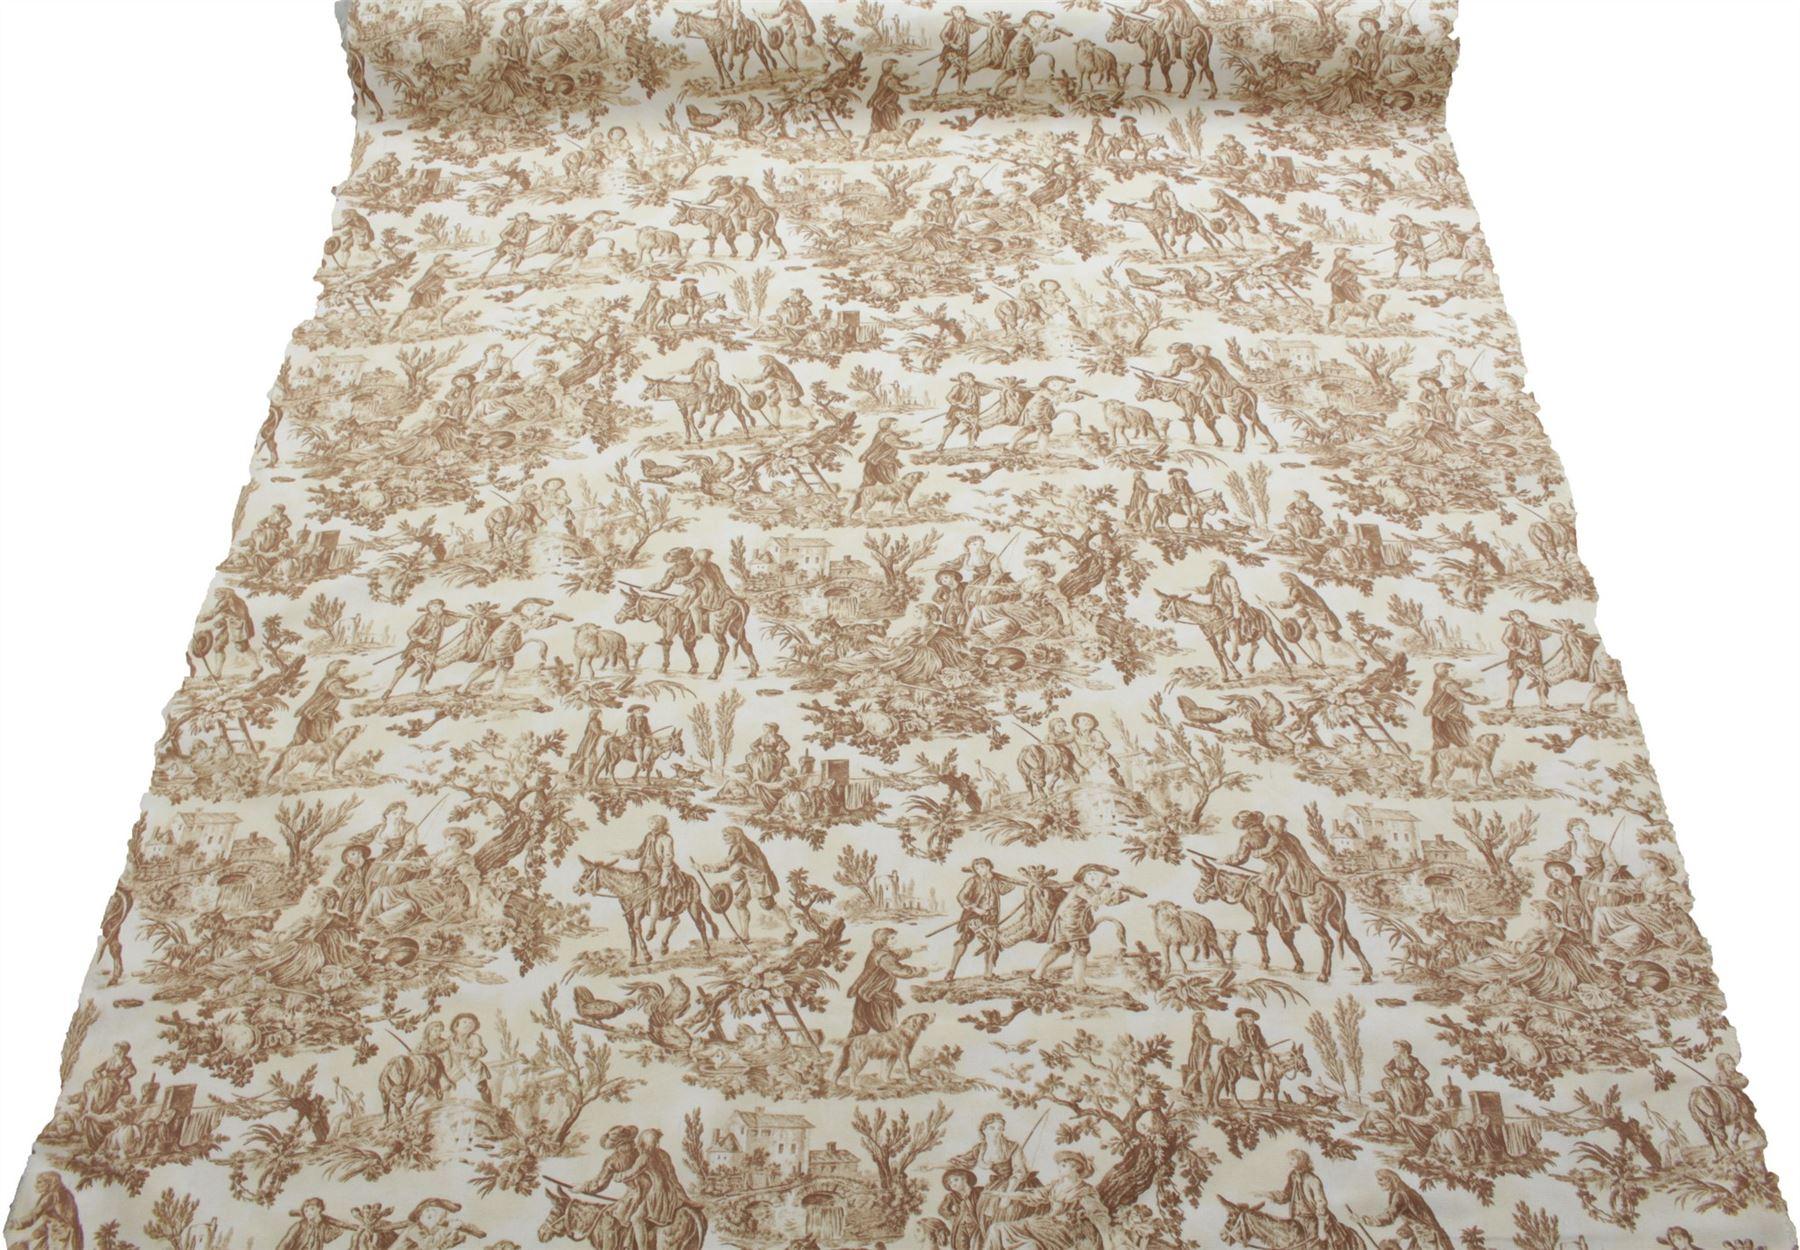 thumbnail 35 - 100% Heavy Cotton Panama Printed Childrens Curtain Cushion Upholstery Fabric